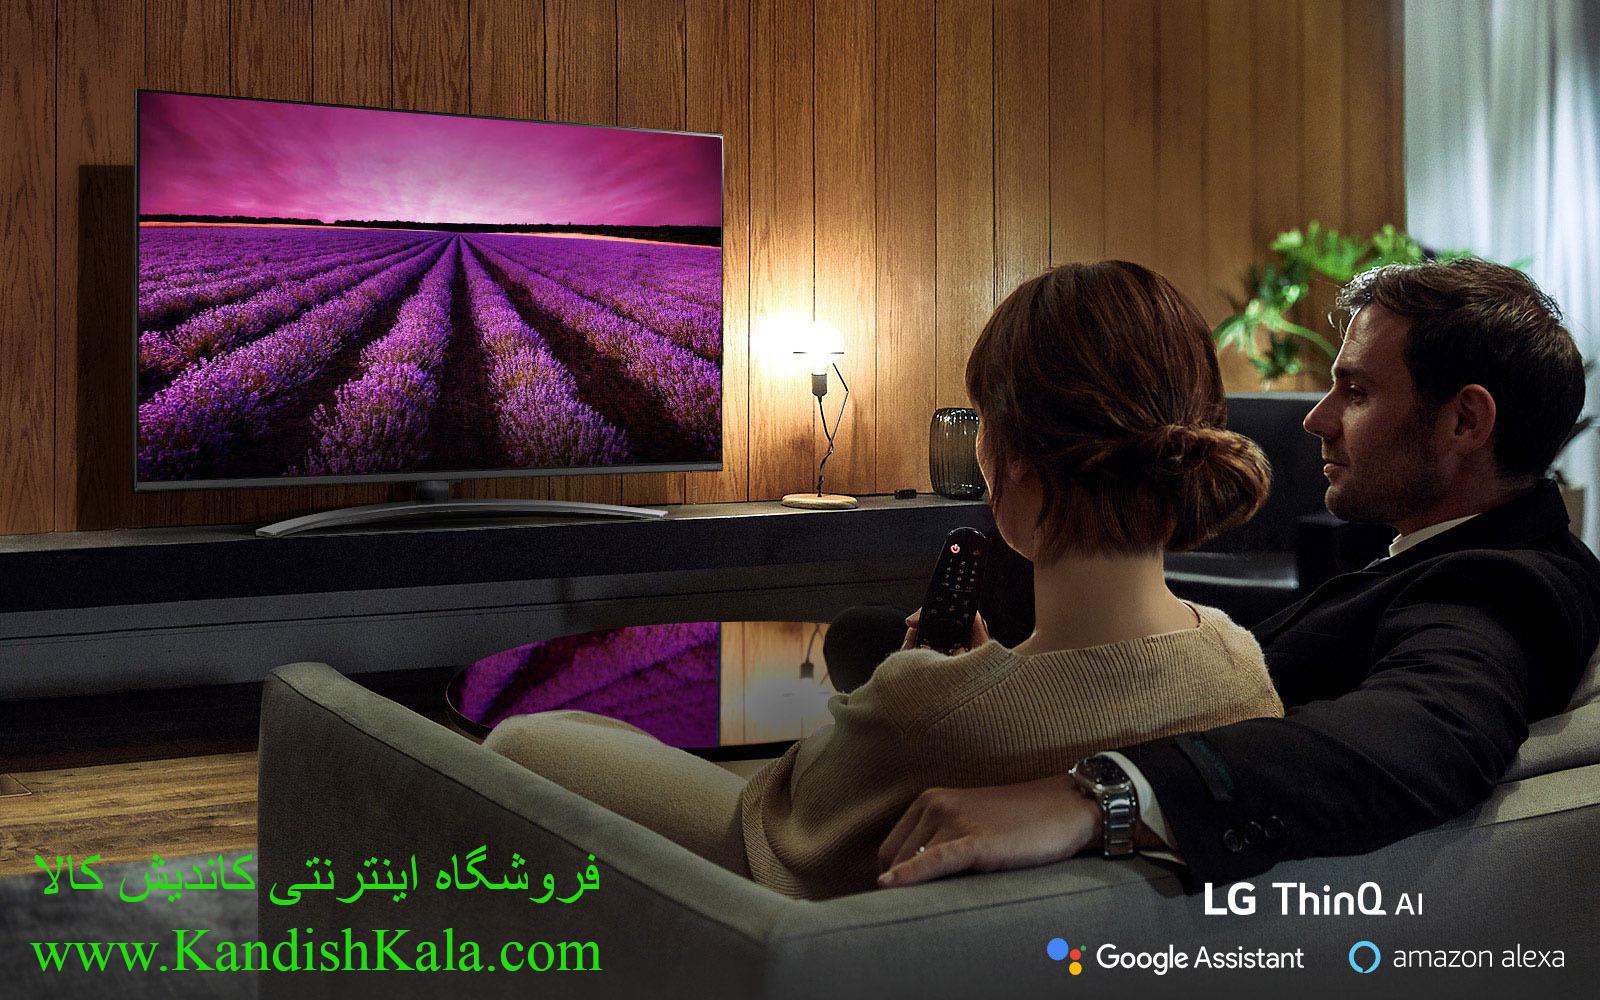 قیمت تلویزیون 43 اینچ ال جی مدل 43UM7100